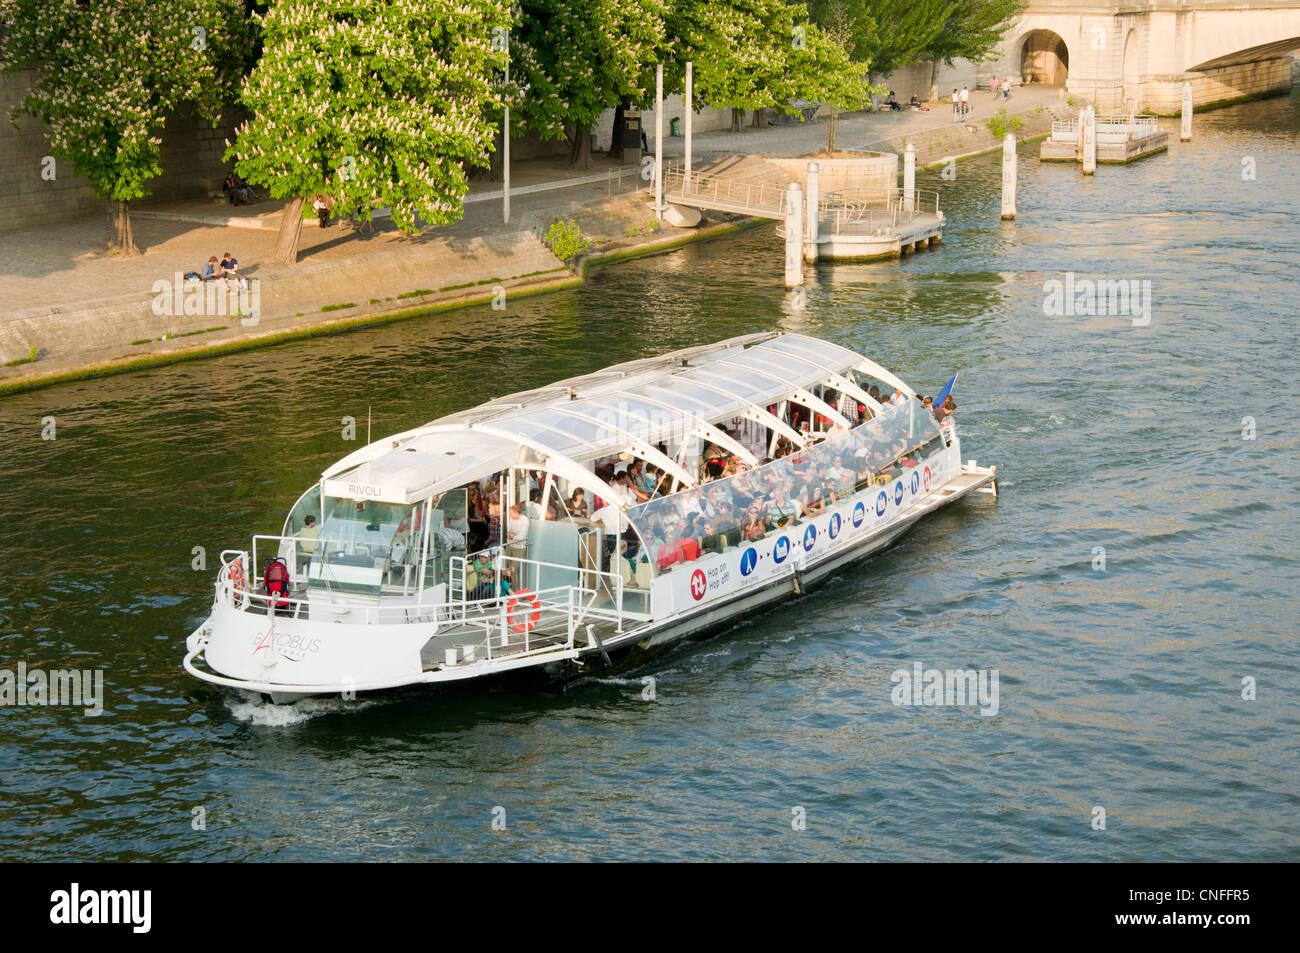 Batobus shuttle boat cruises the River Seine